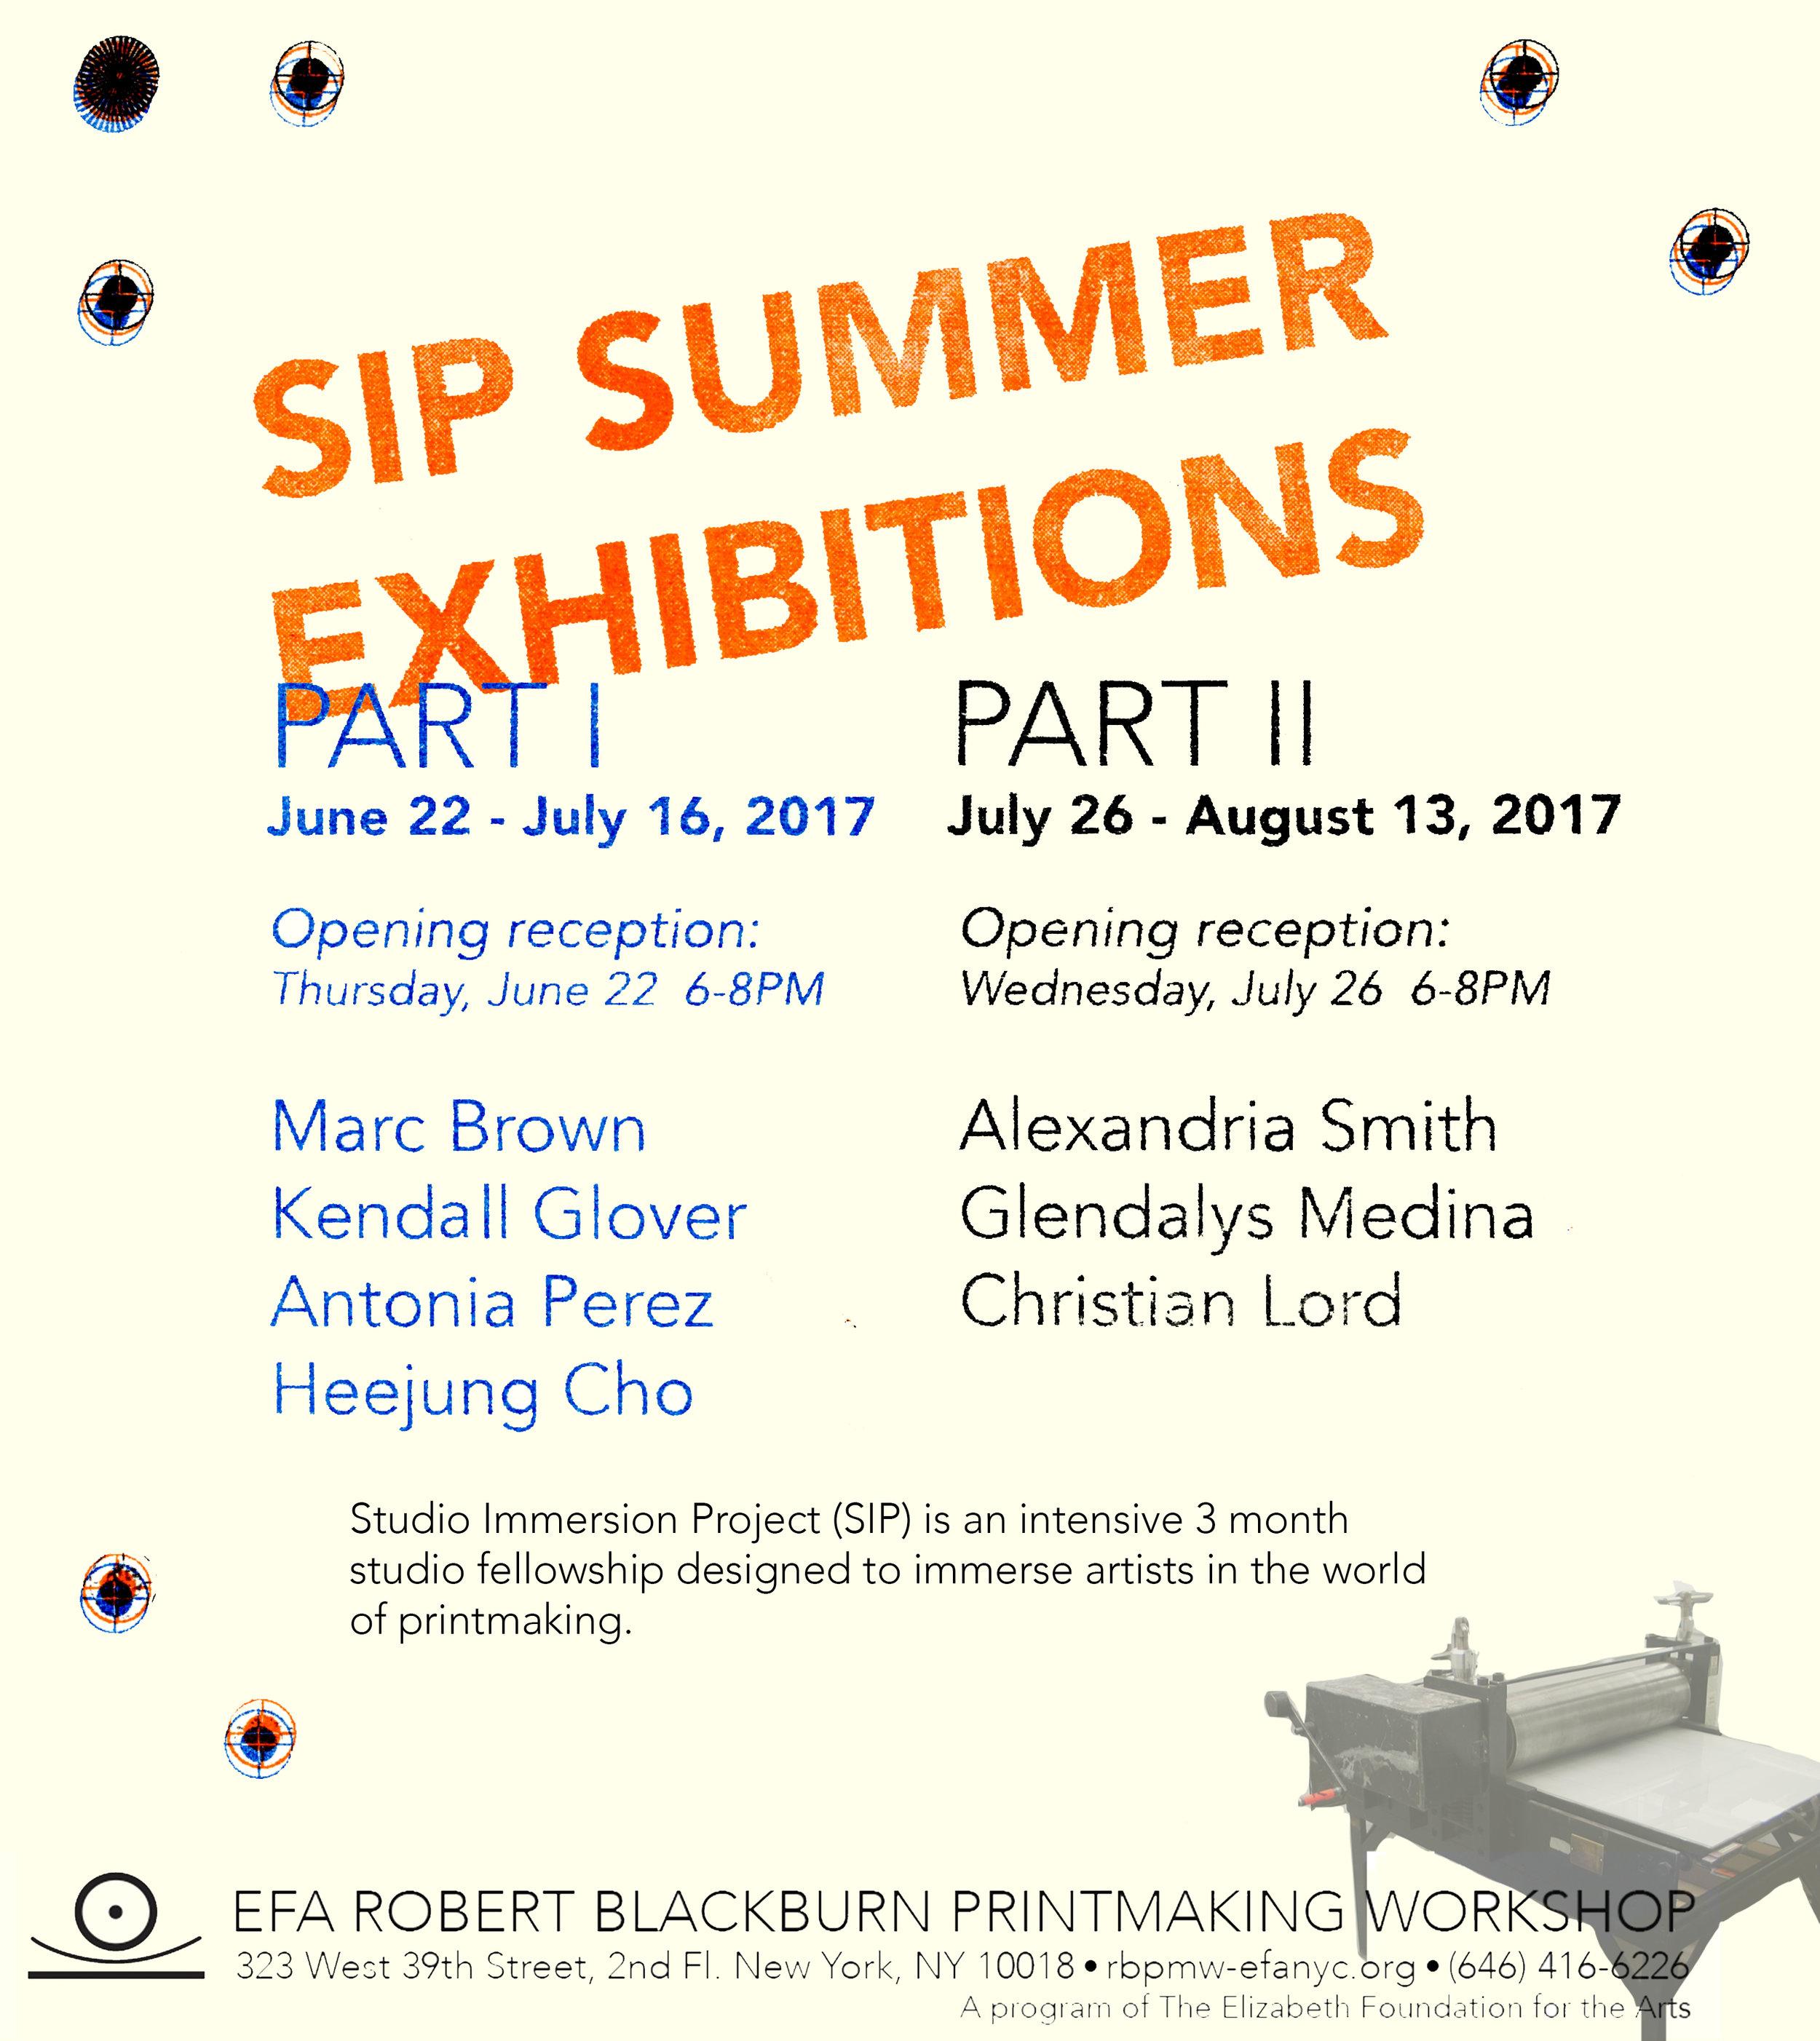 SIP Summer Exhibition Part 2  July 26 - August 13, 2017